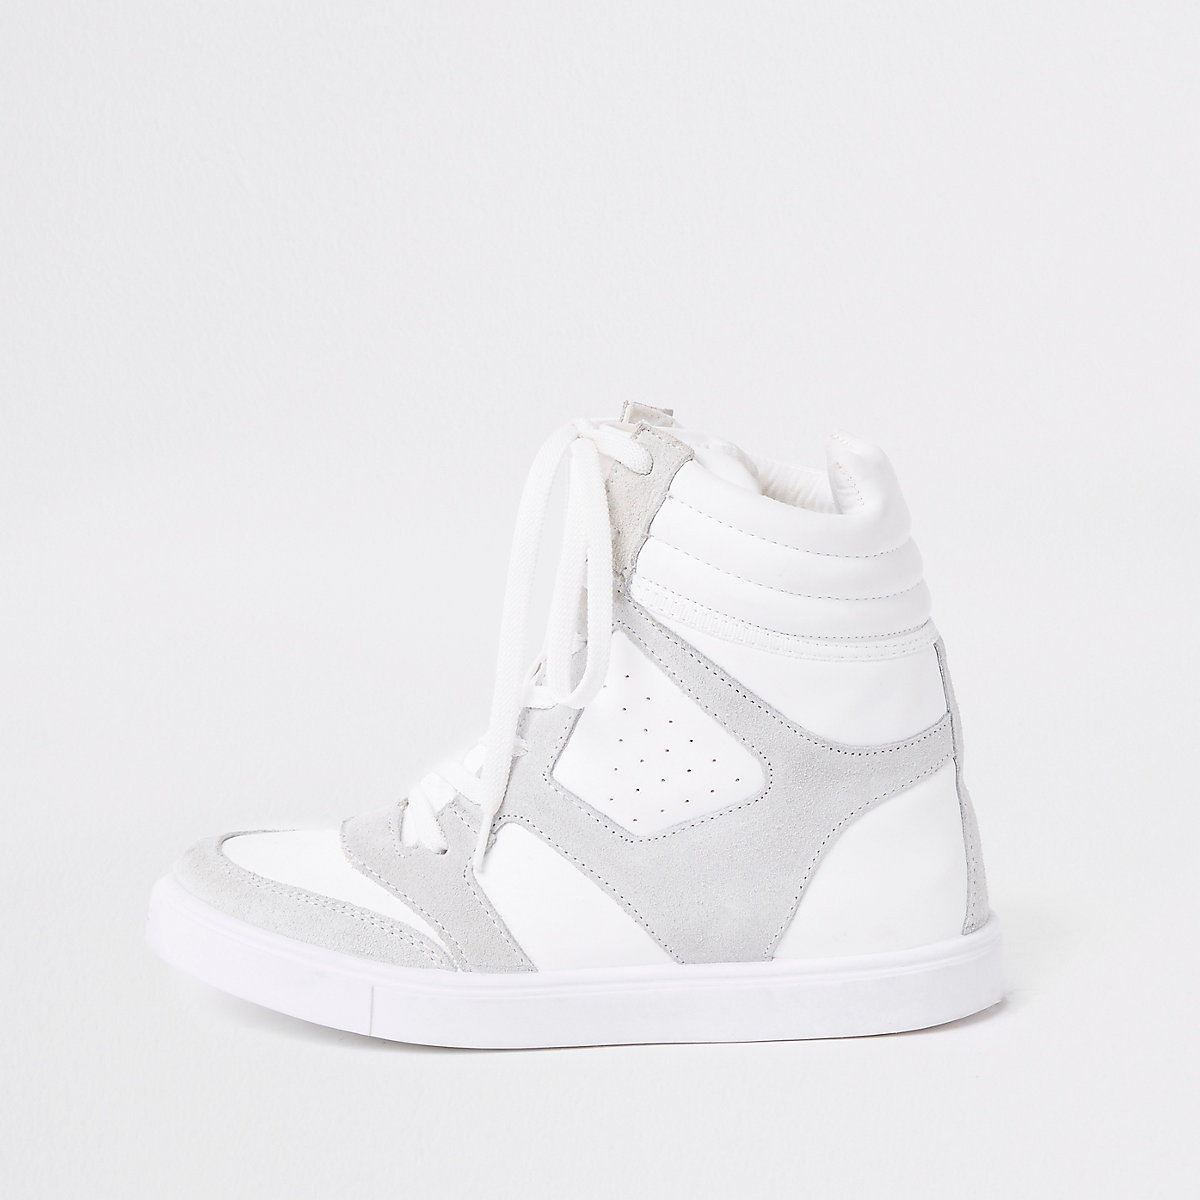 White hidden wedge high top sneakers